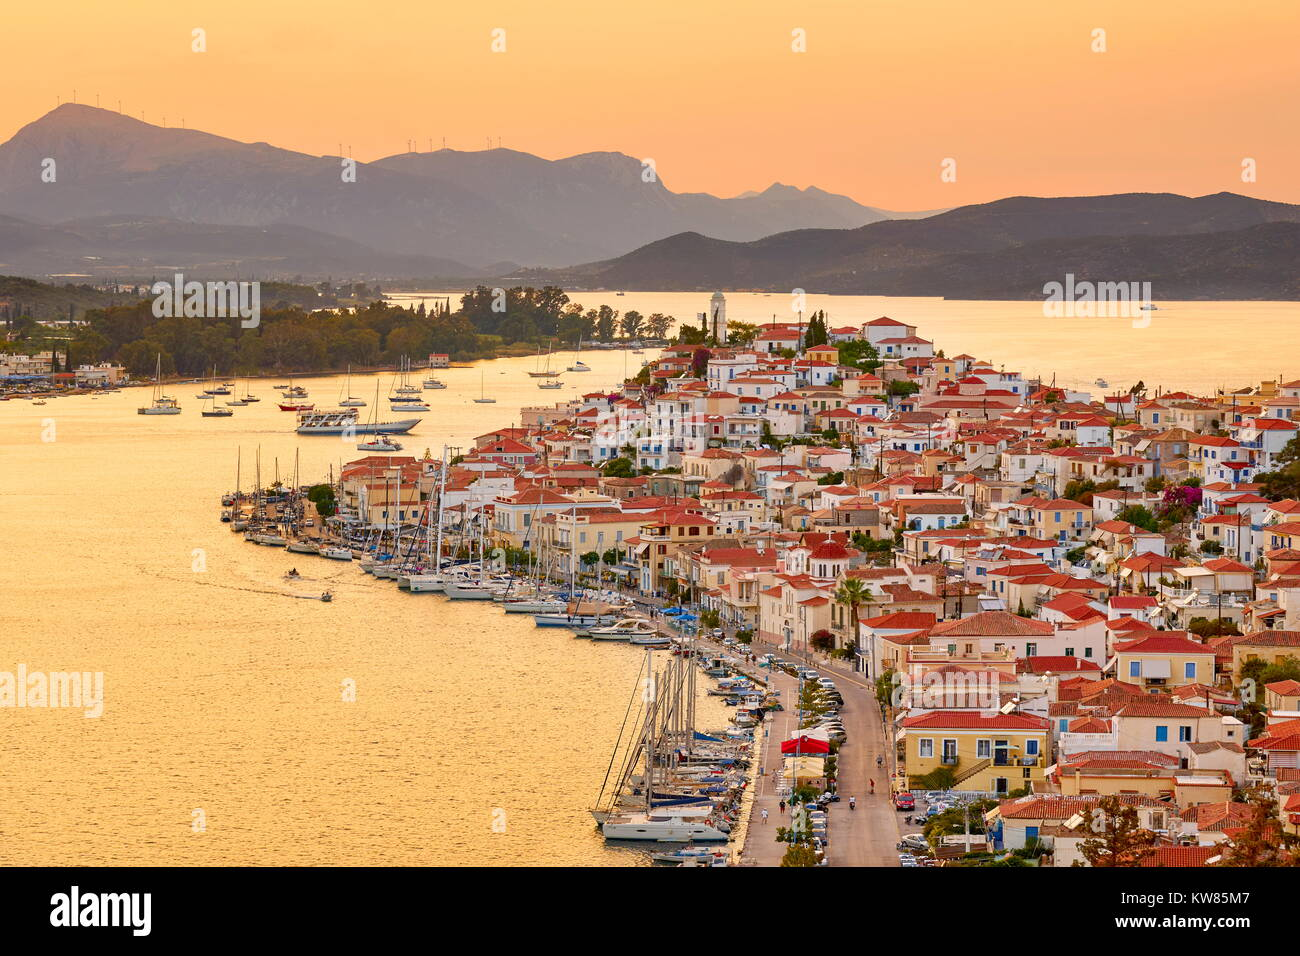 Poros Island, at sunset time, Argolida, Peloponnese, Greece Stock Photo